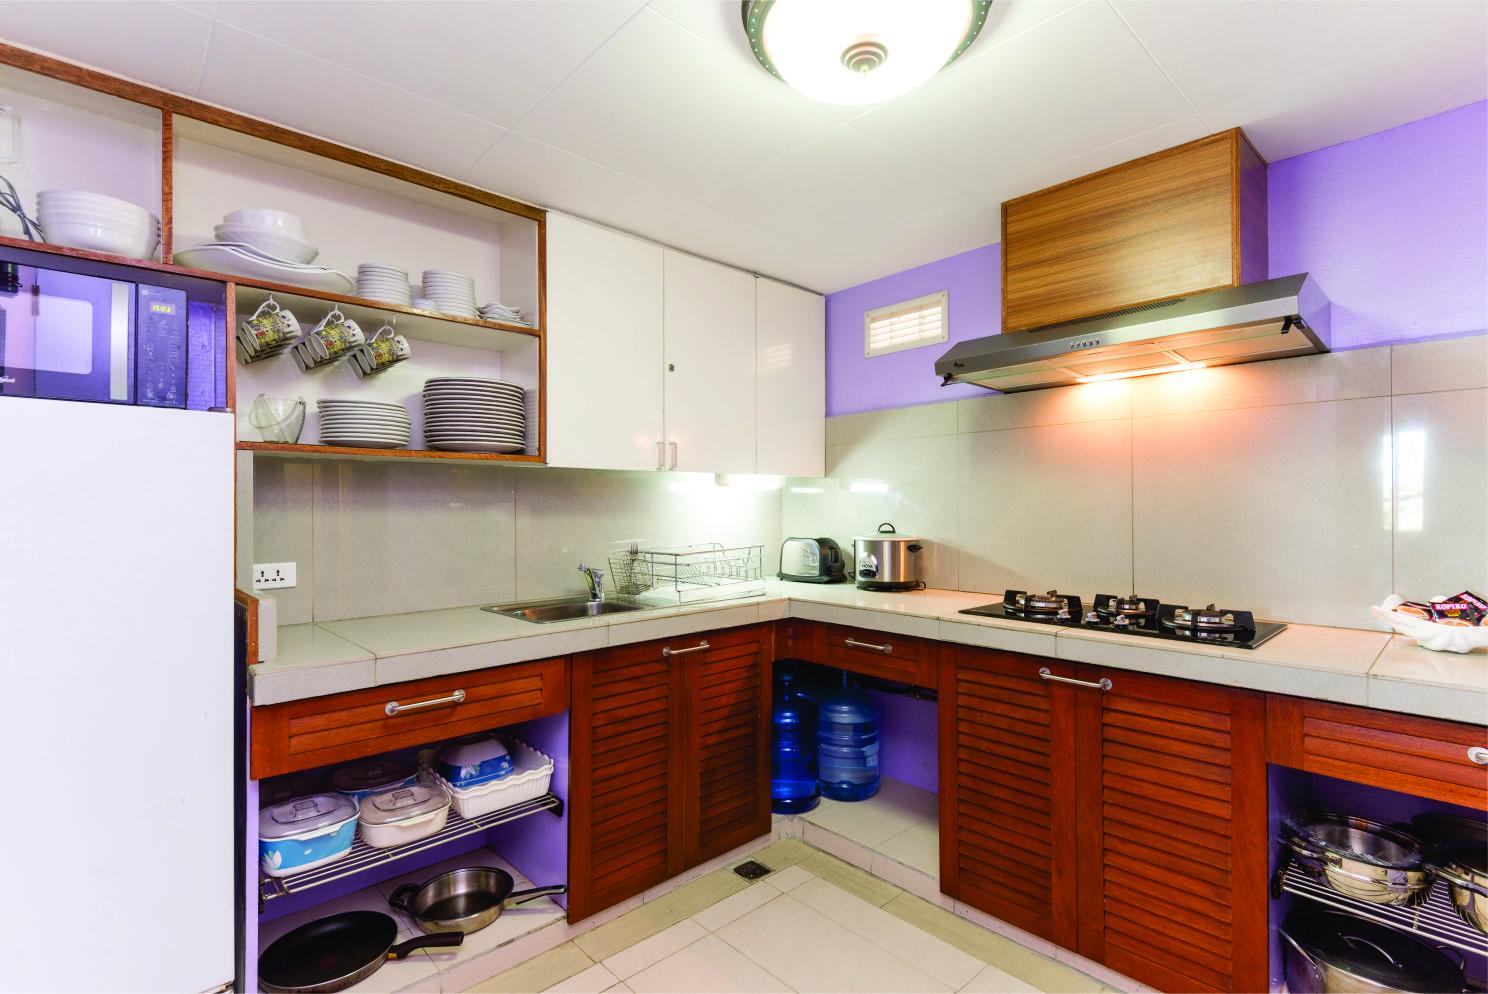 Baguio Transient Condo Kitchen